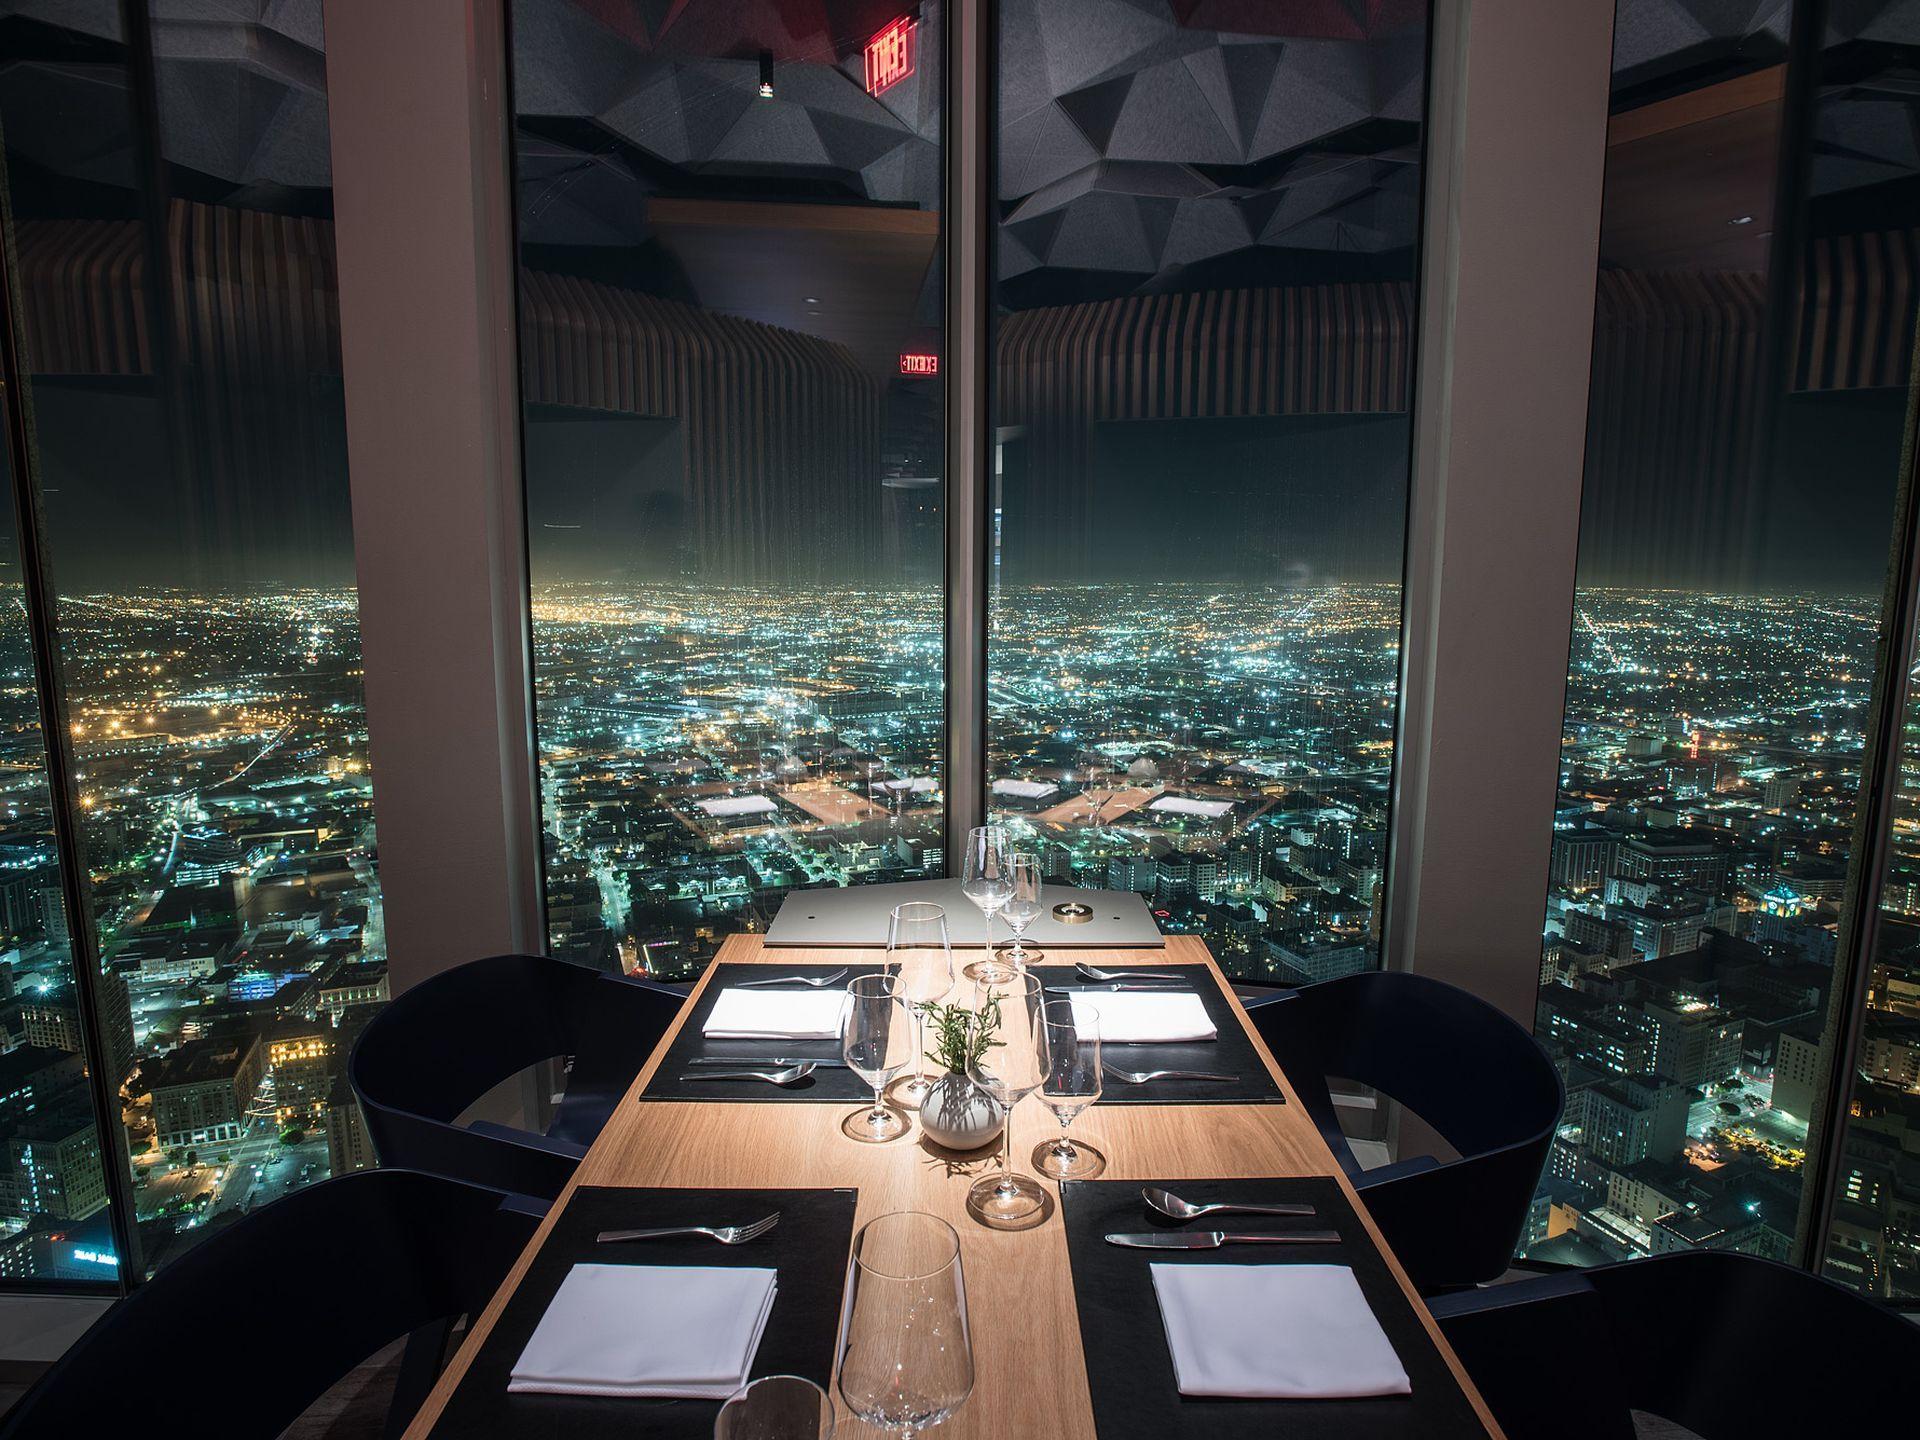 20 Restaurants With Amazing Views In Los Angeles Best Restaurants Los Angeles Los Angeles Restaurants Los Angeles Nightlife